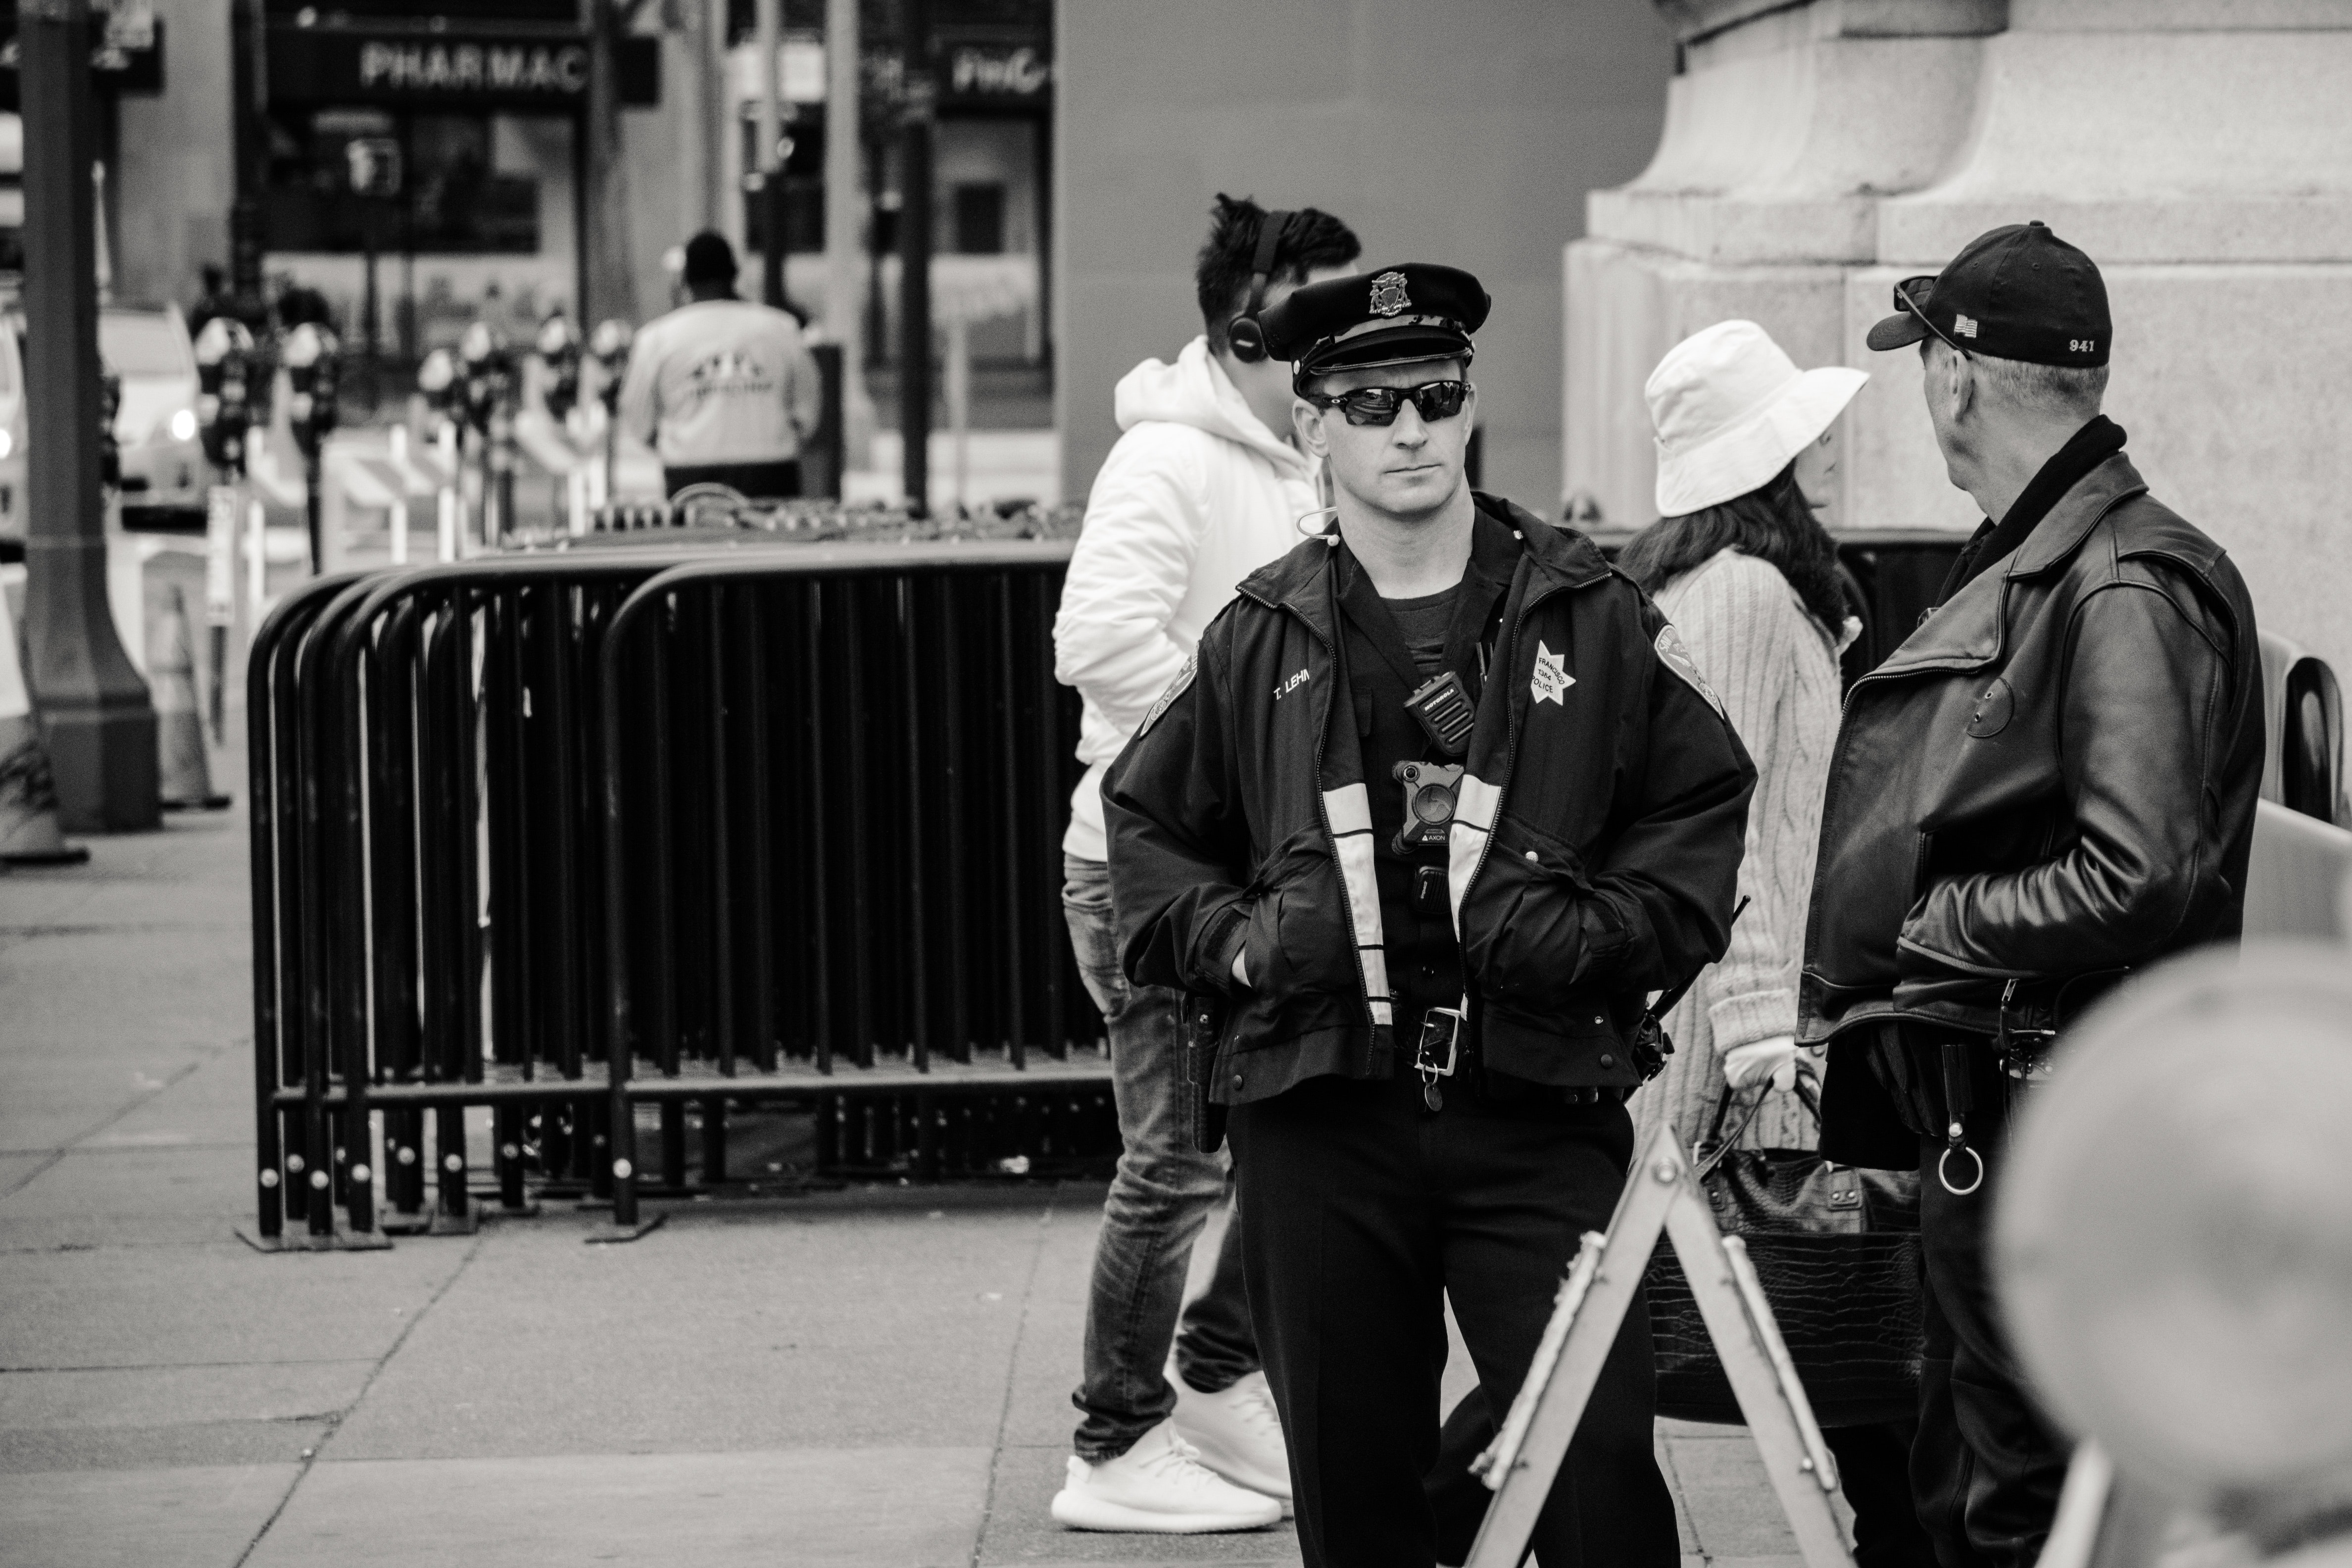 He's Not My Partner Because He's My Boyfriend, He's My Partner Because We're Both Cops